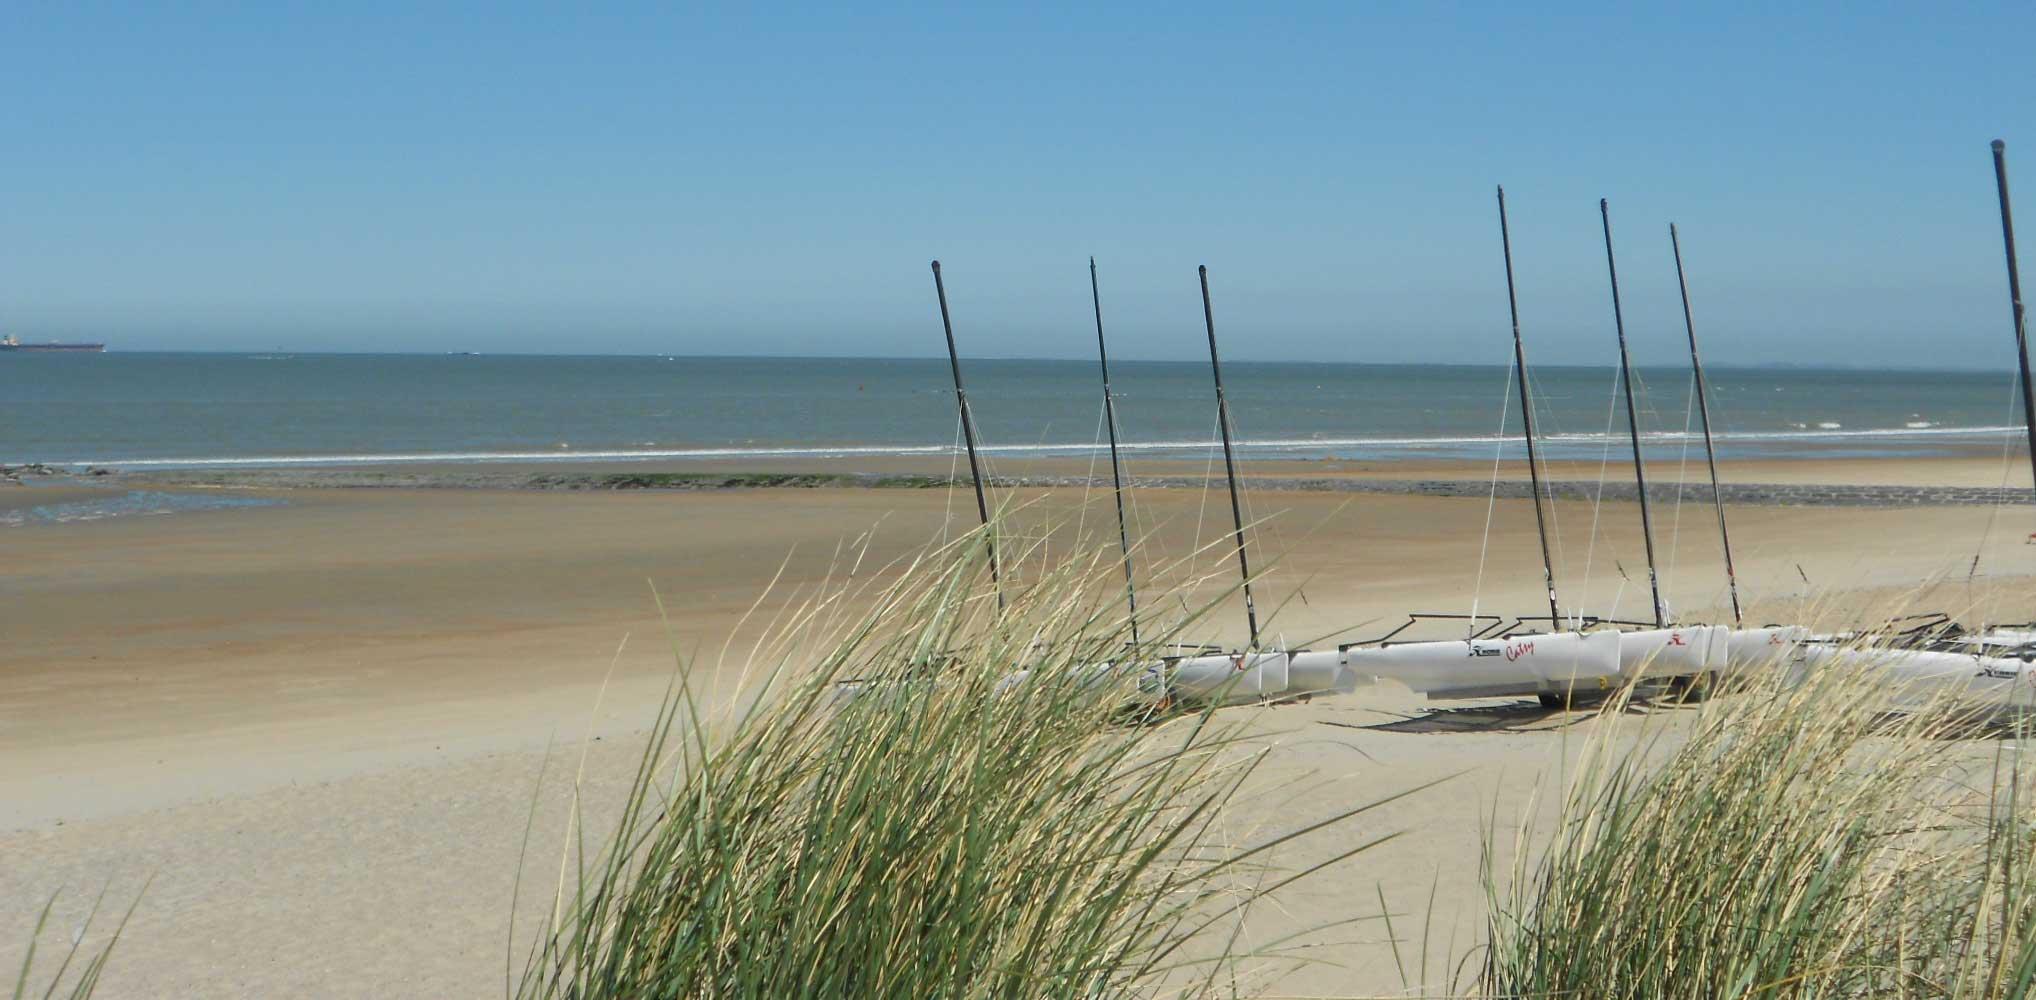 Knokke-Heist derde populairste bestemming van de kust